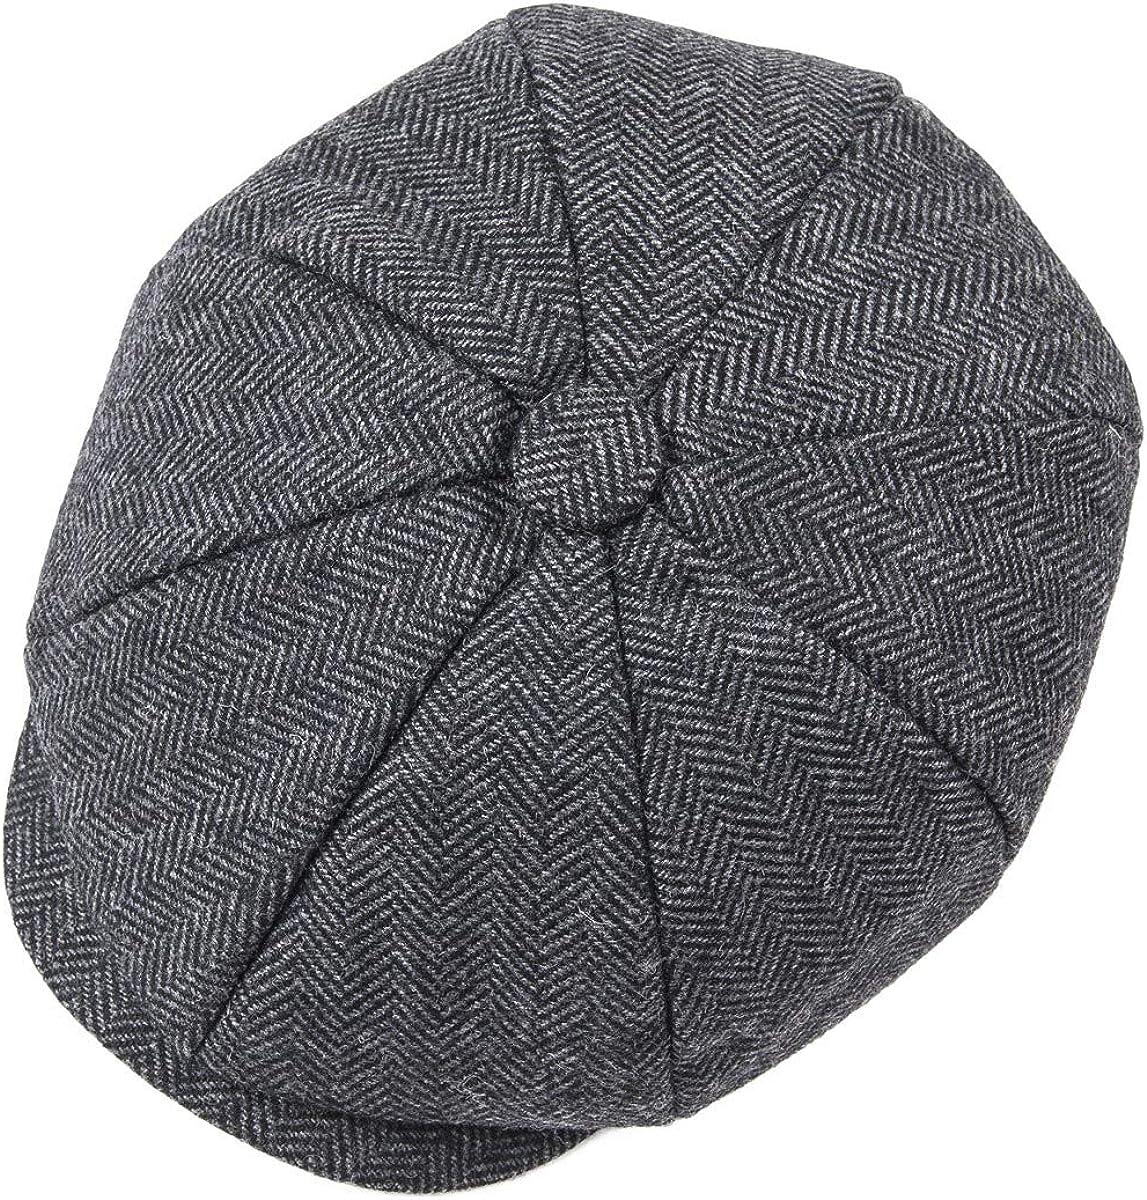 JANGOUL Boys Vintage Newsboy Cap Tweed Flat Beret Cabbie Hat for Kids Toddler Pageboy